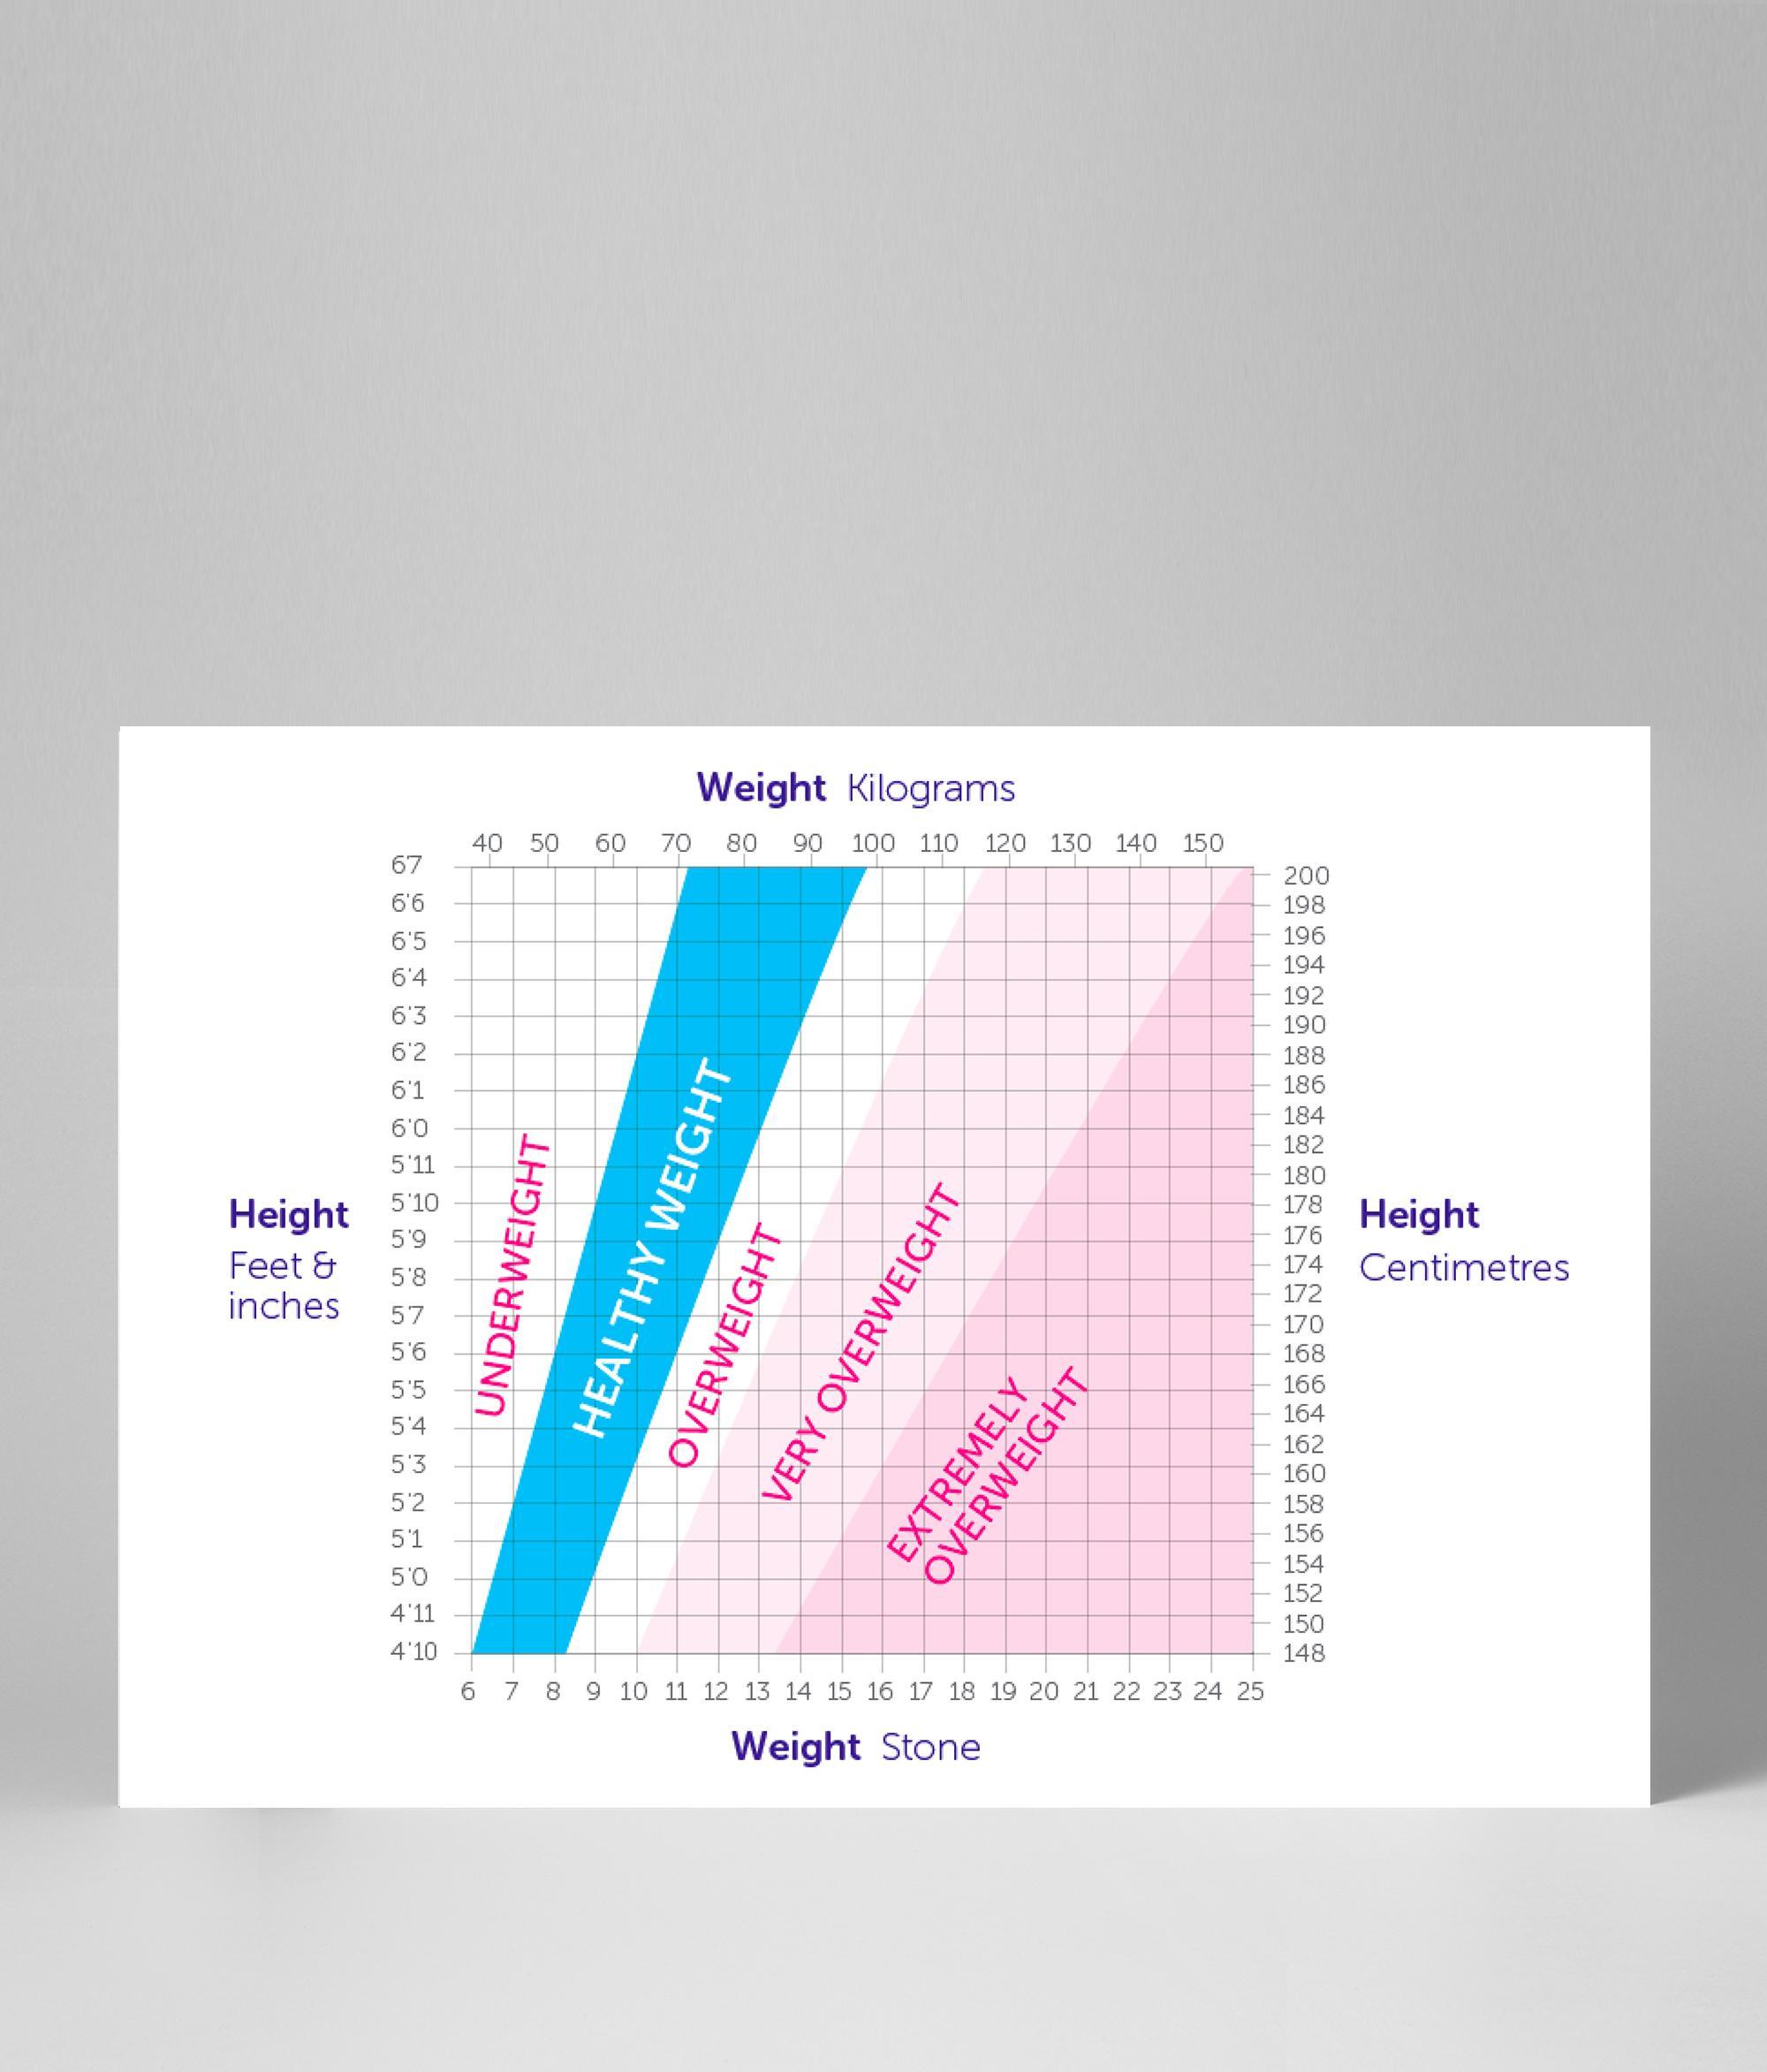 A3 bmi chart publications a3 bmi chart nvjuhfo Gallery